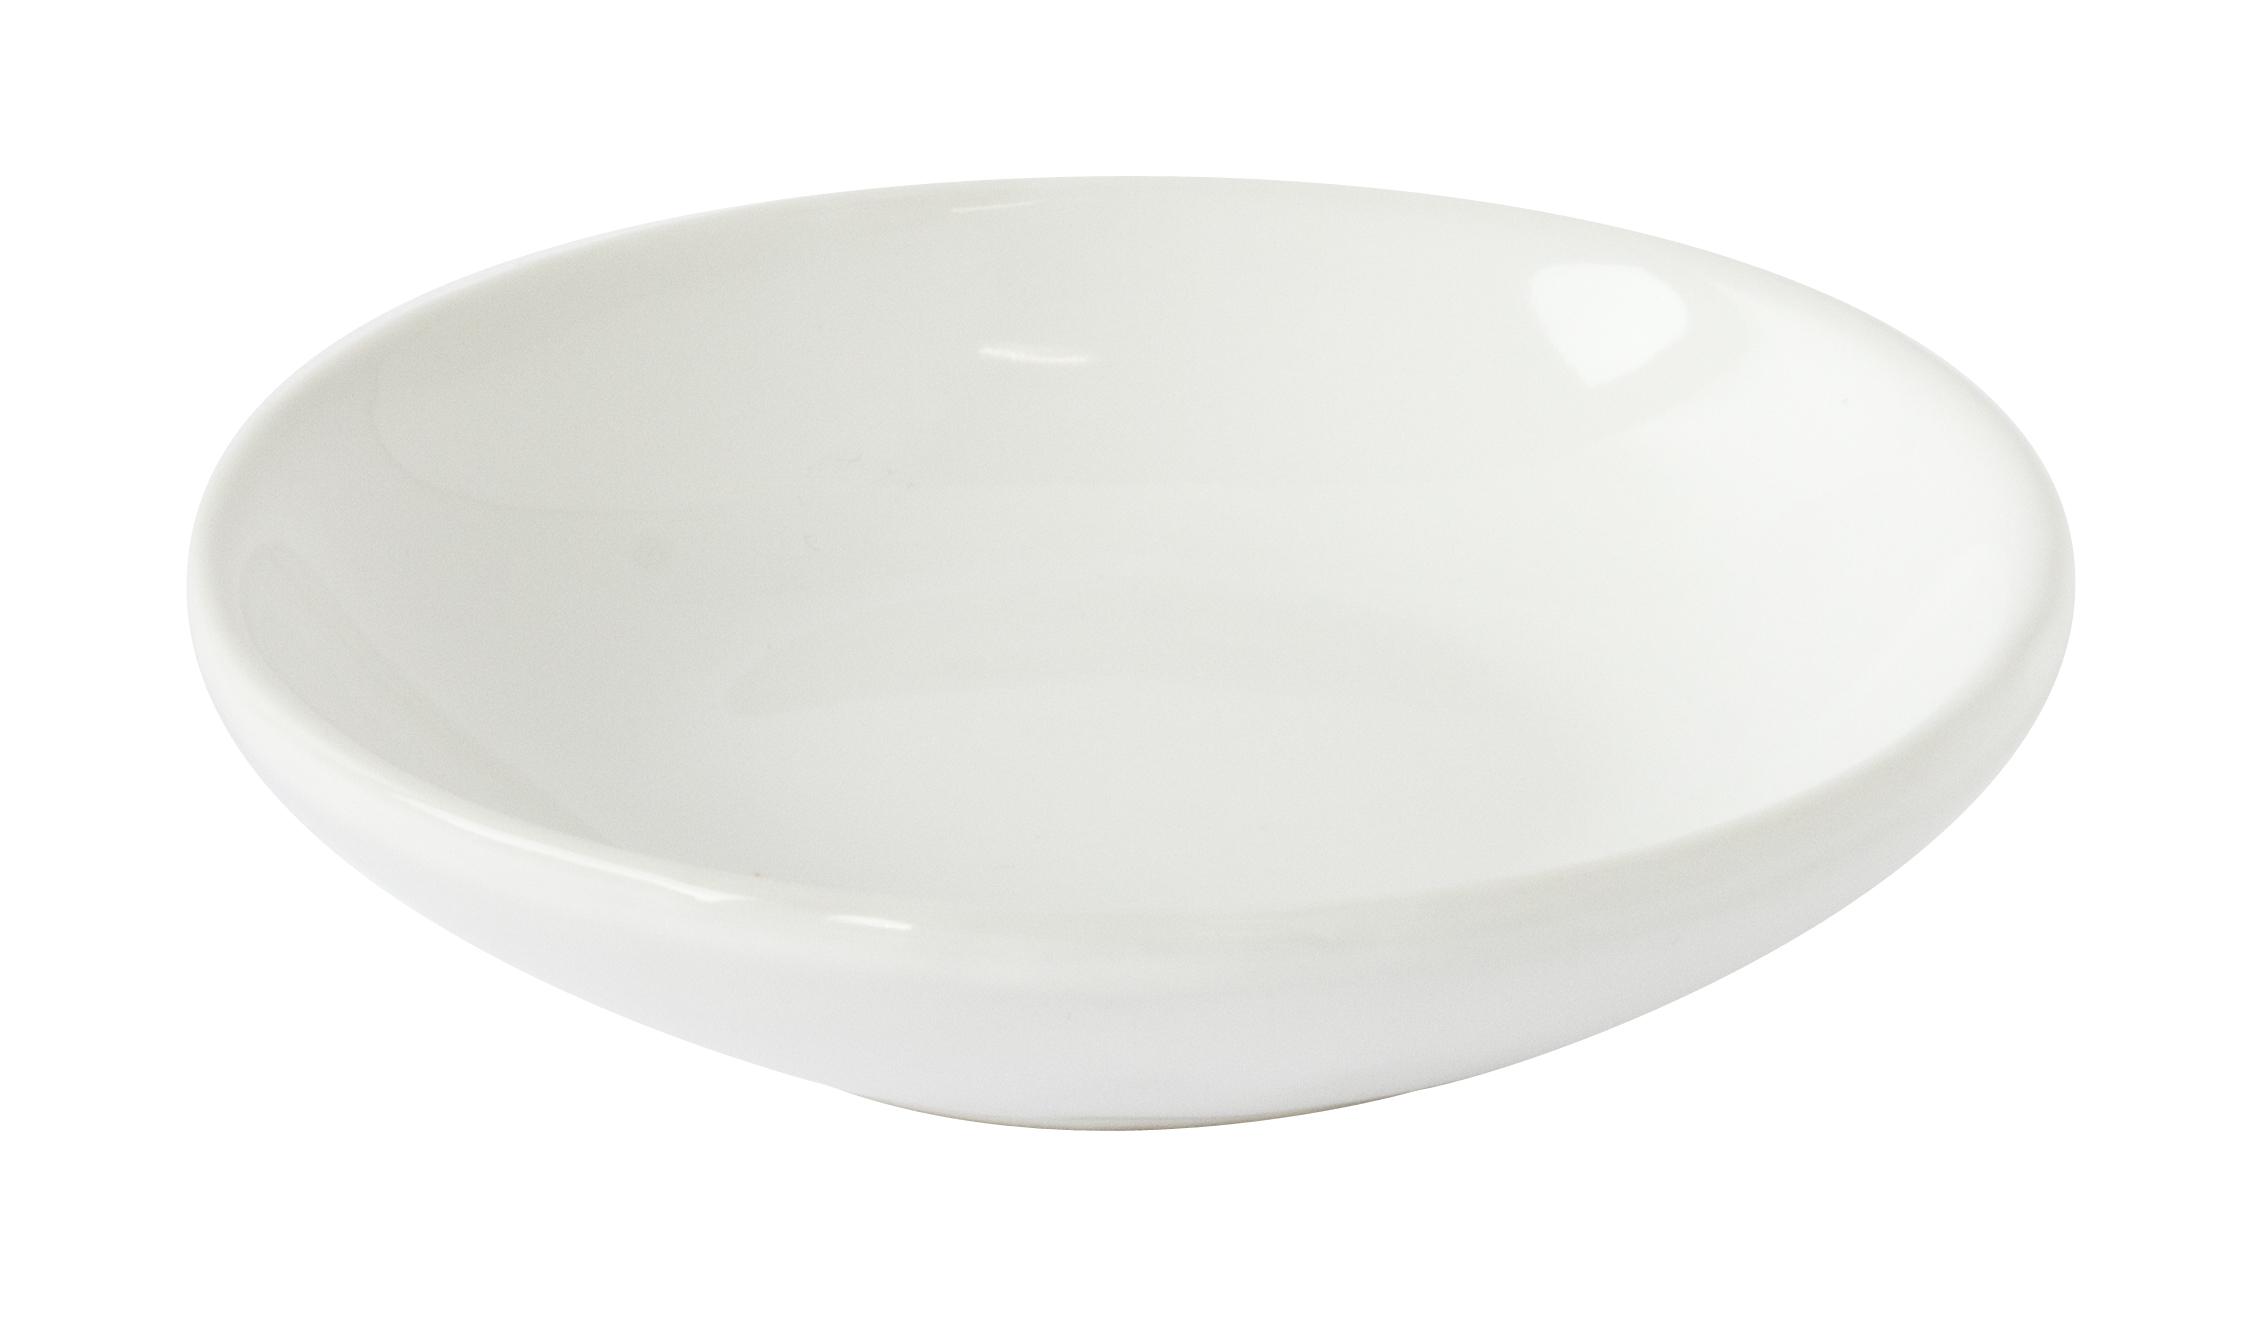 Porte savon en ceramique ovale blanc homebain vente for Porte savon douche ceramique